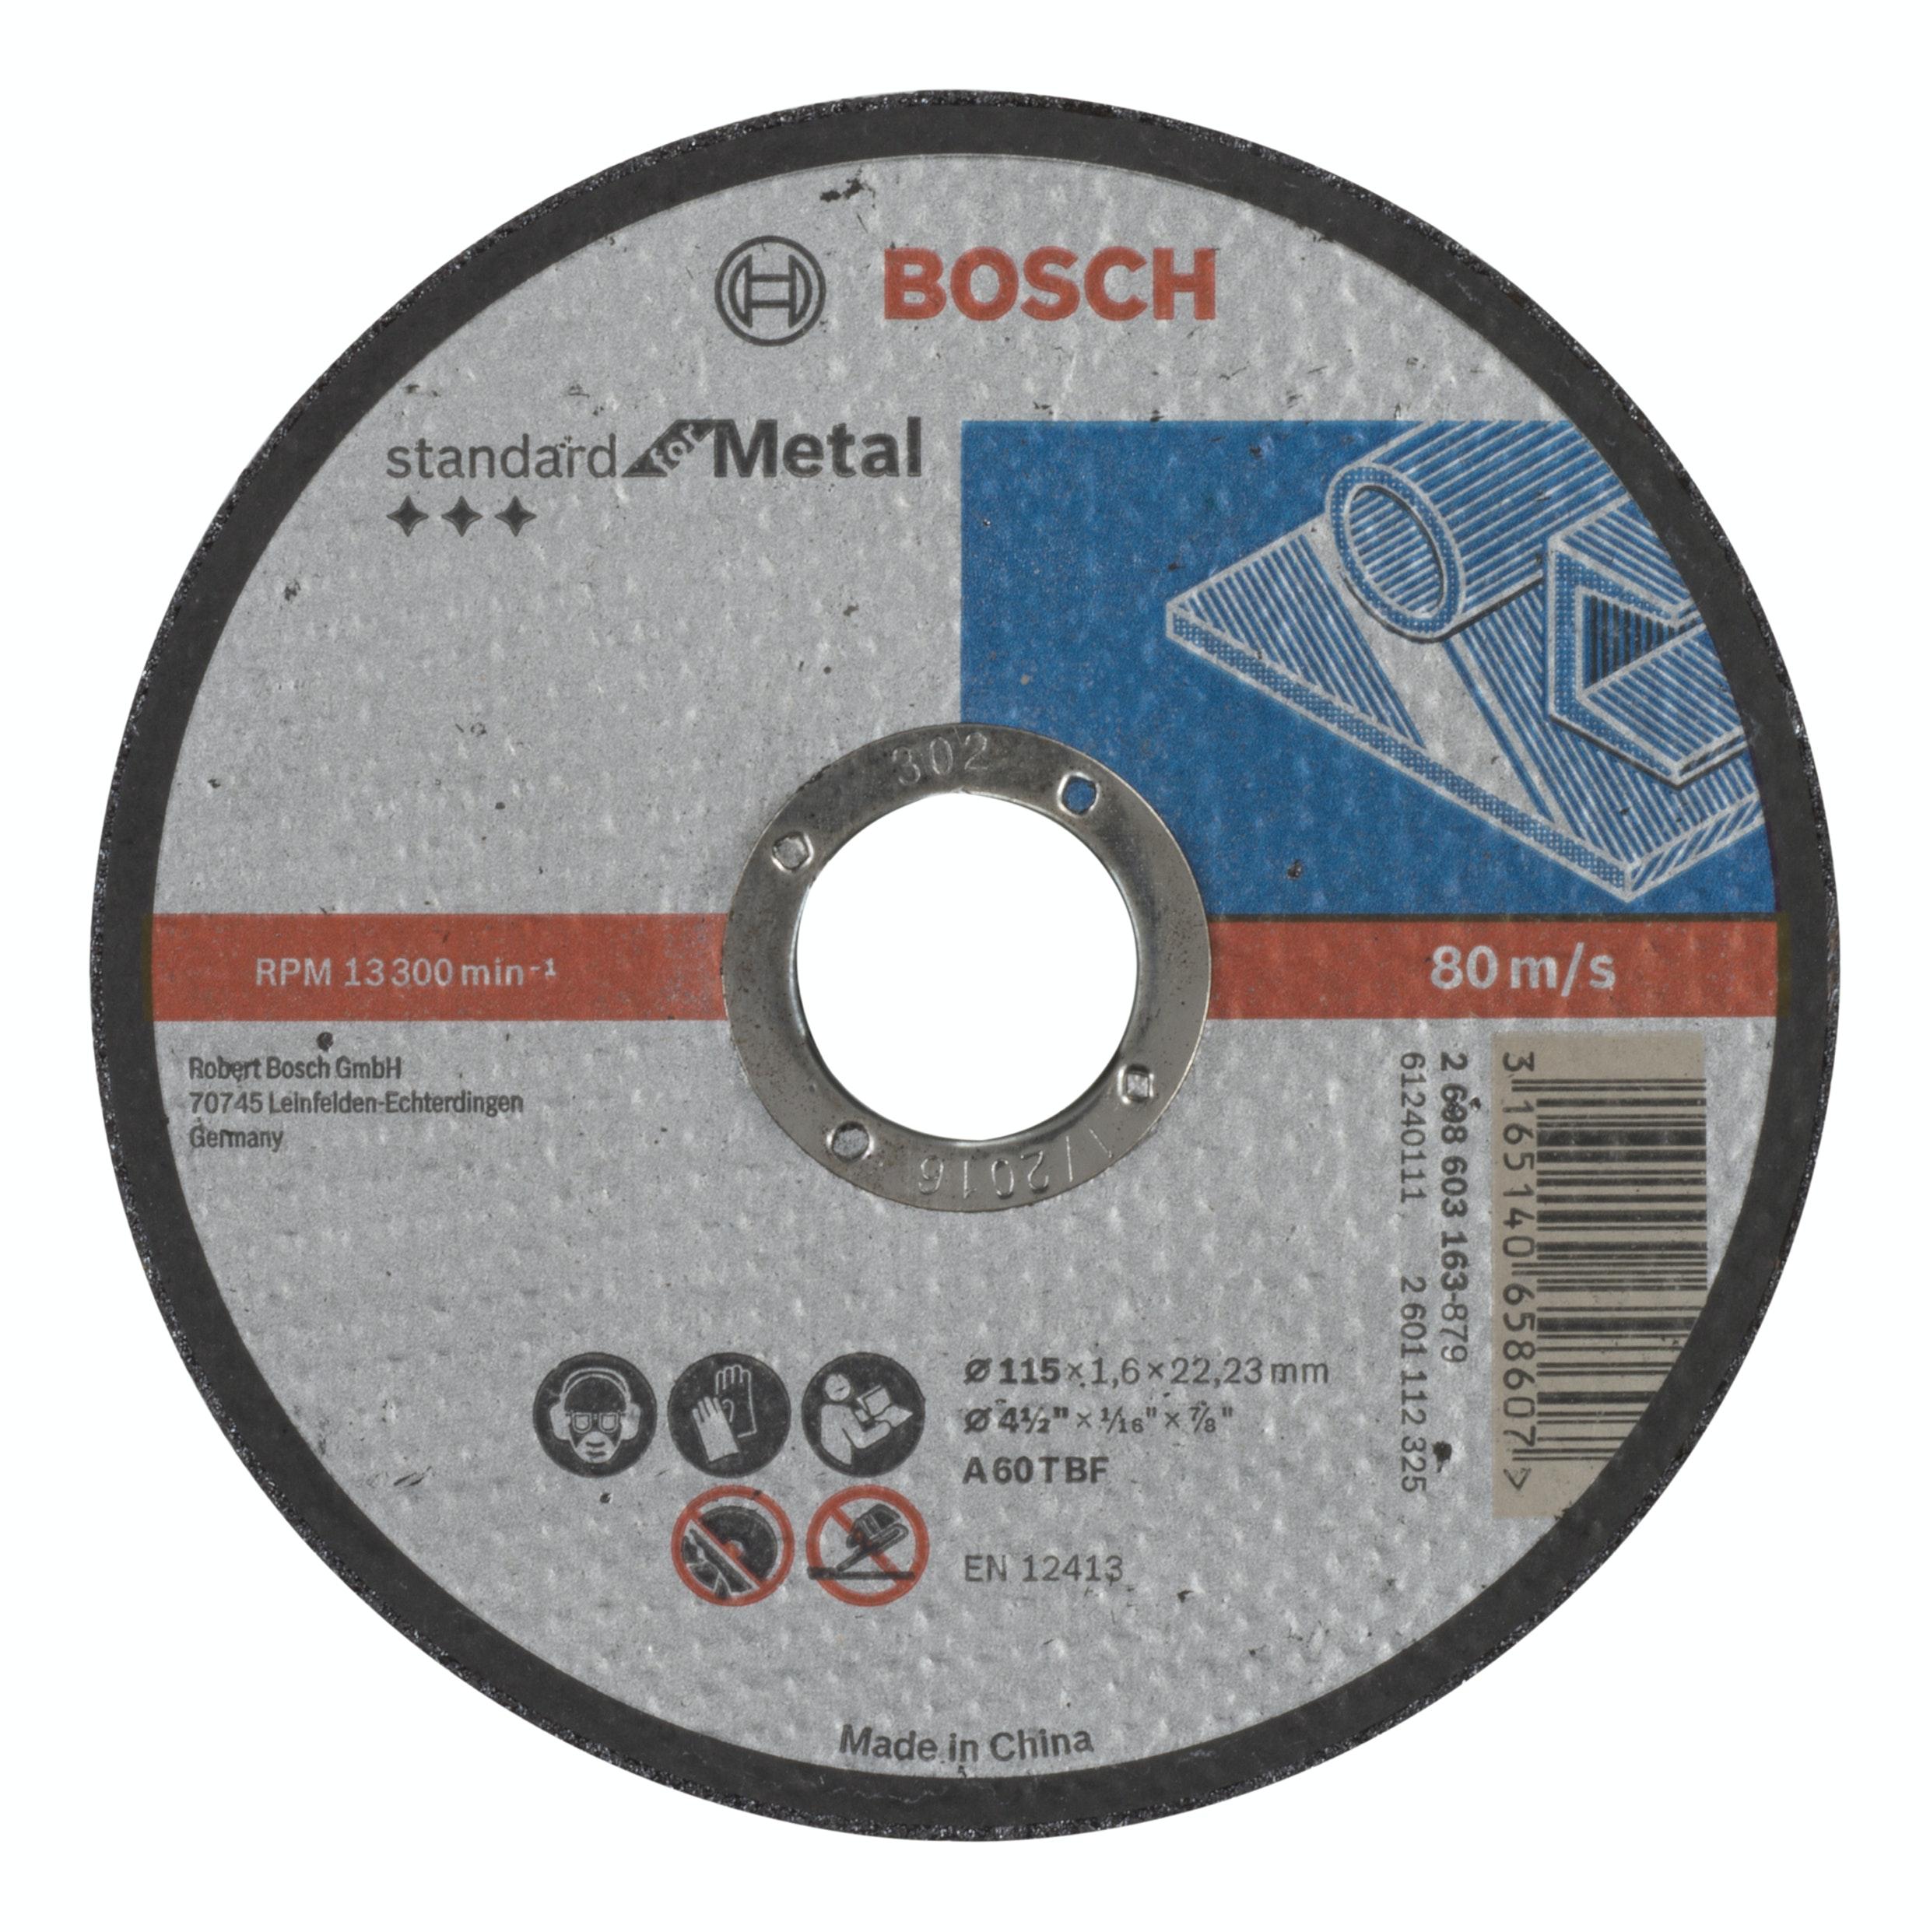 Kapskiva Bosch Rak 115X1,6mm